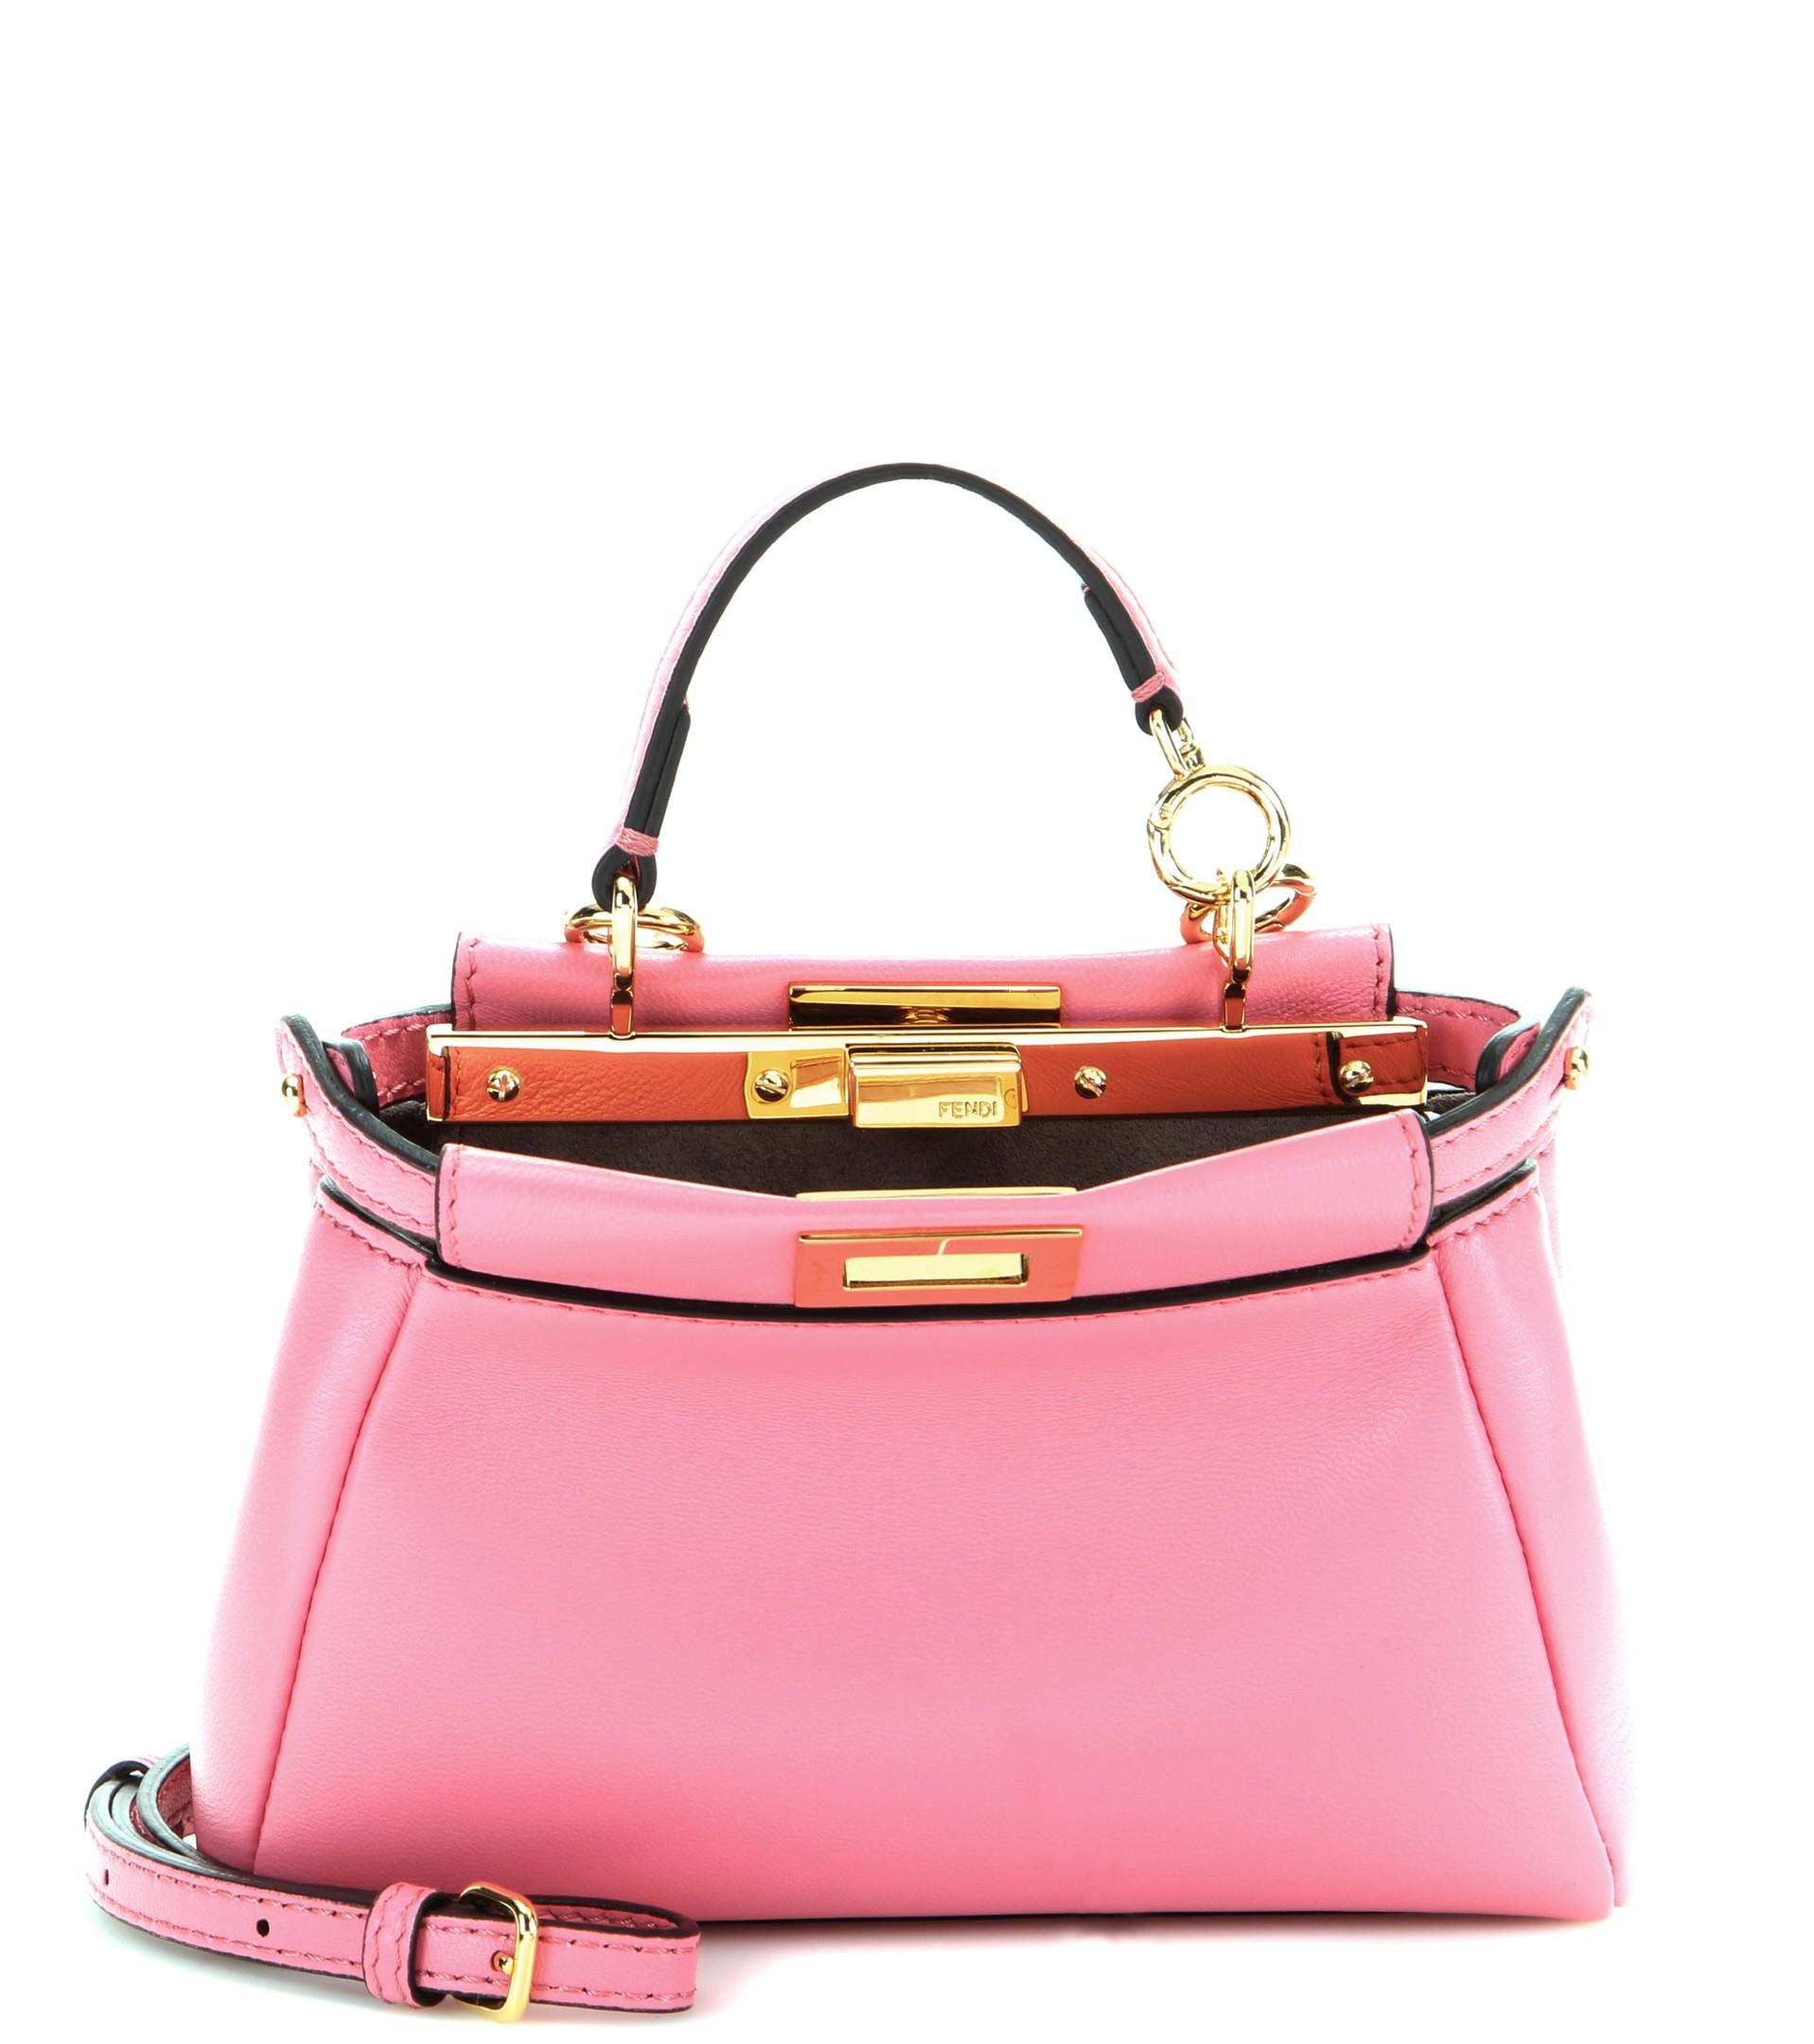 5f44cc7936 ... cheapest fendi micro peekaboo leather shoulder bag in pink lyst fce57  78065